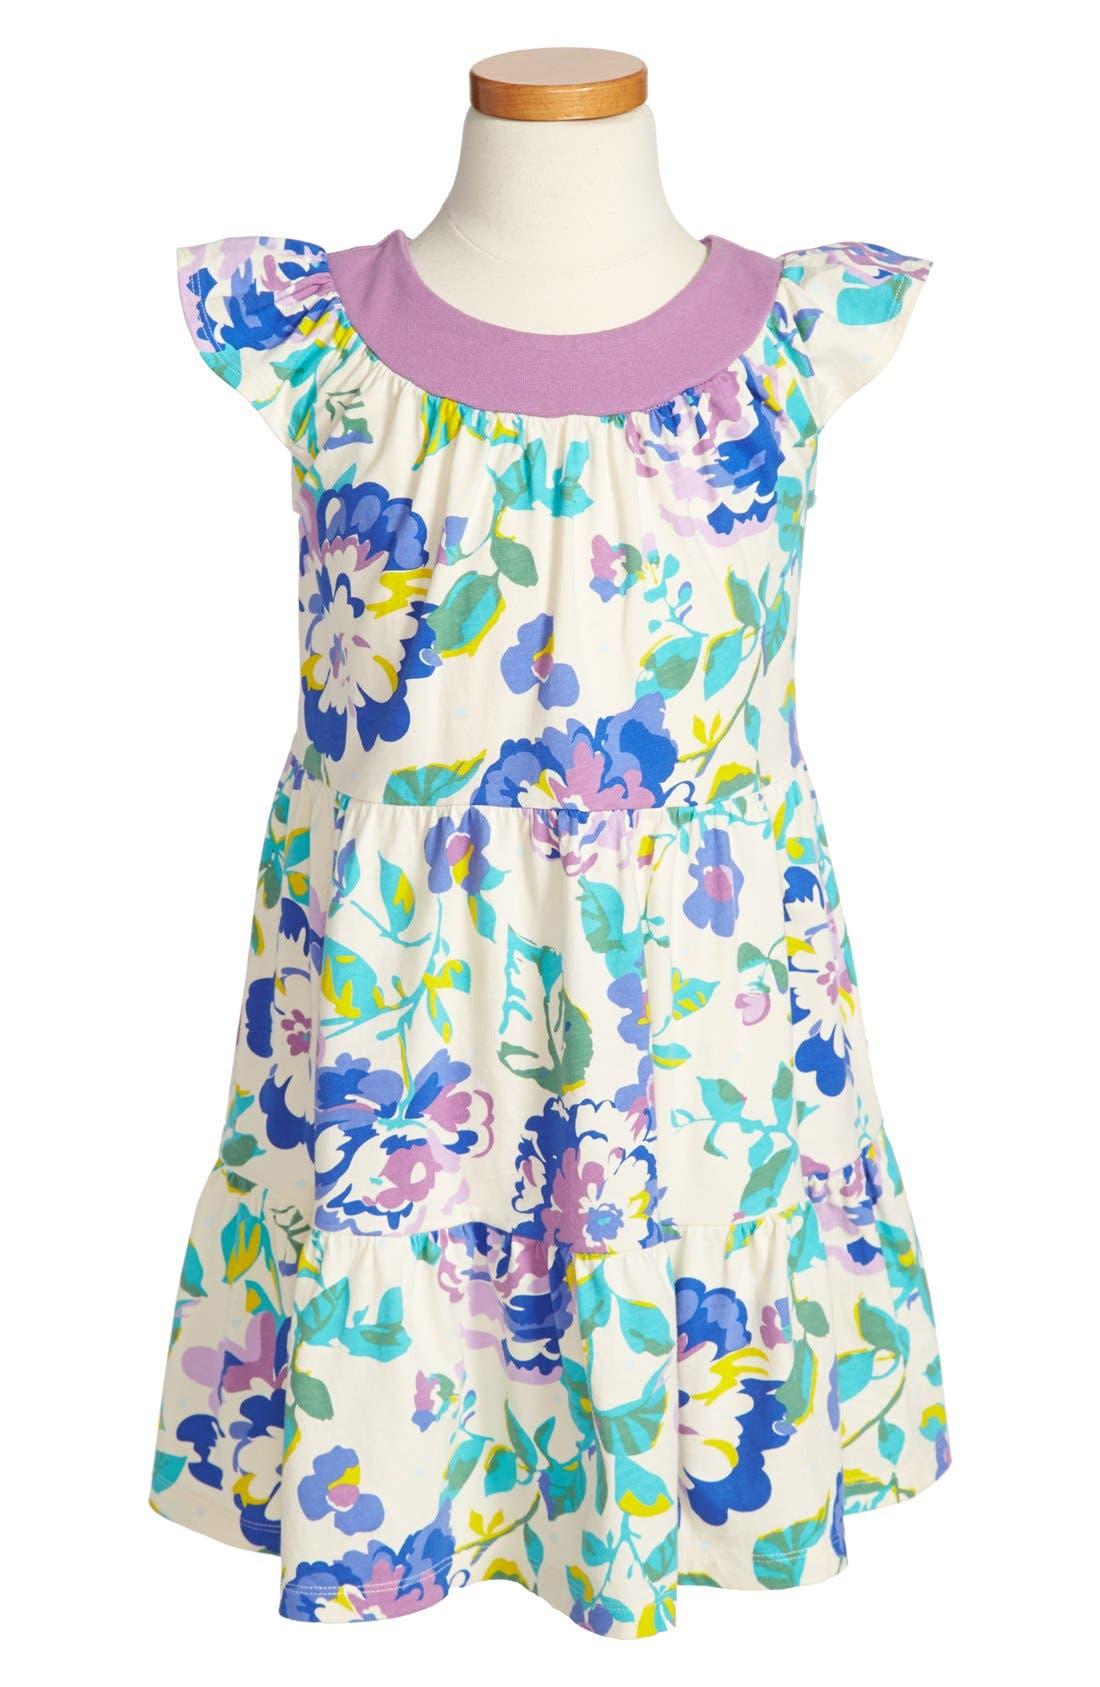 Main Image - Tea Collection 'Desert Rose' Twirl Dress (Toddler Girls, Little Girls & Big Girls)